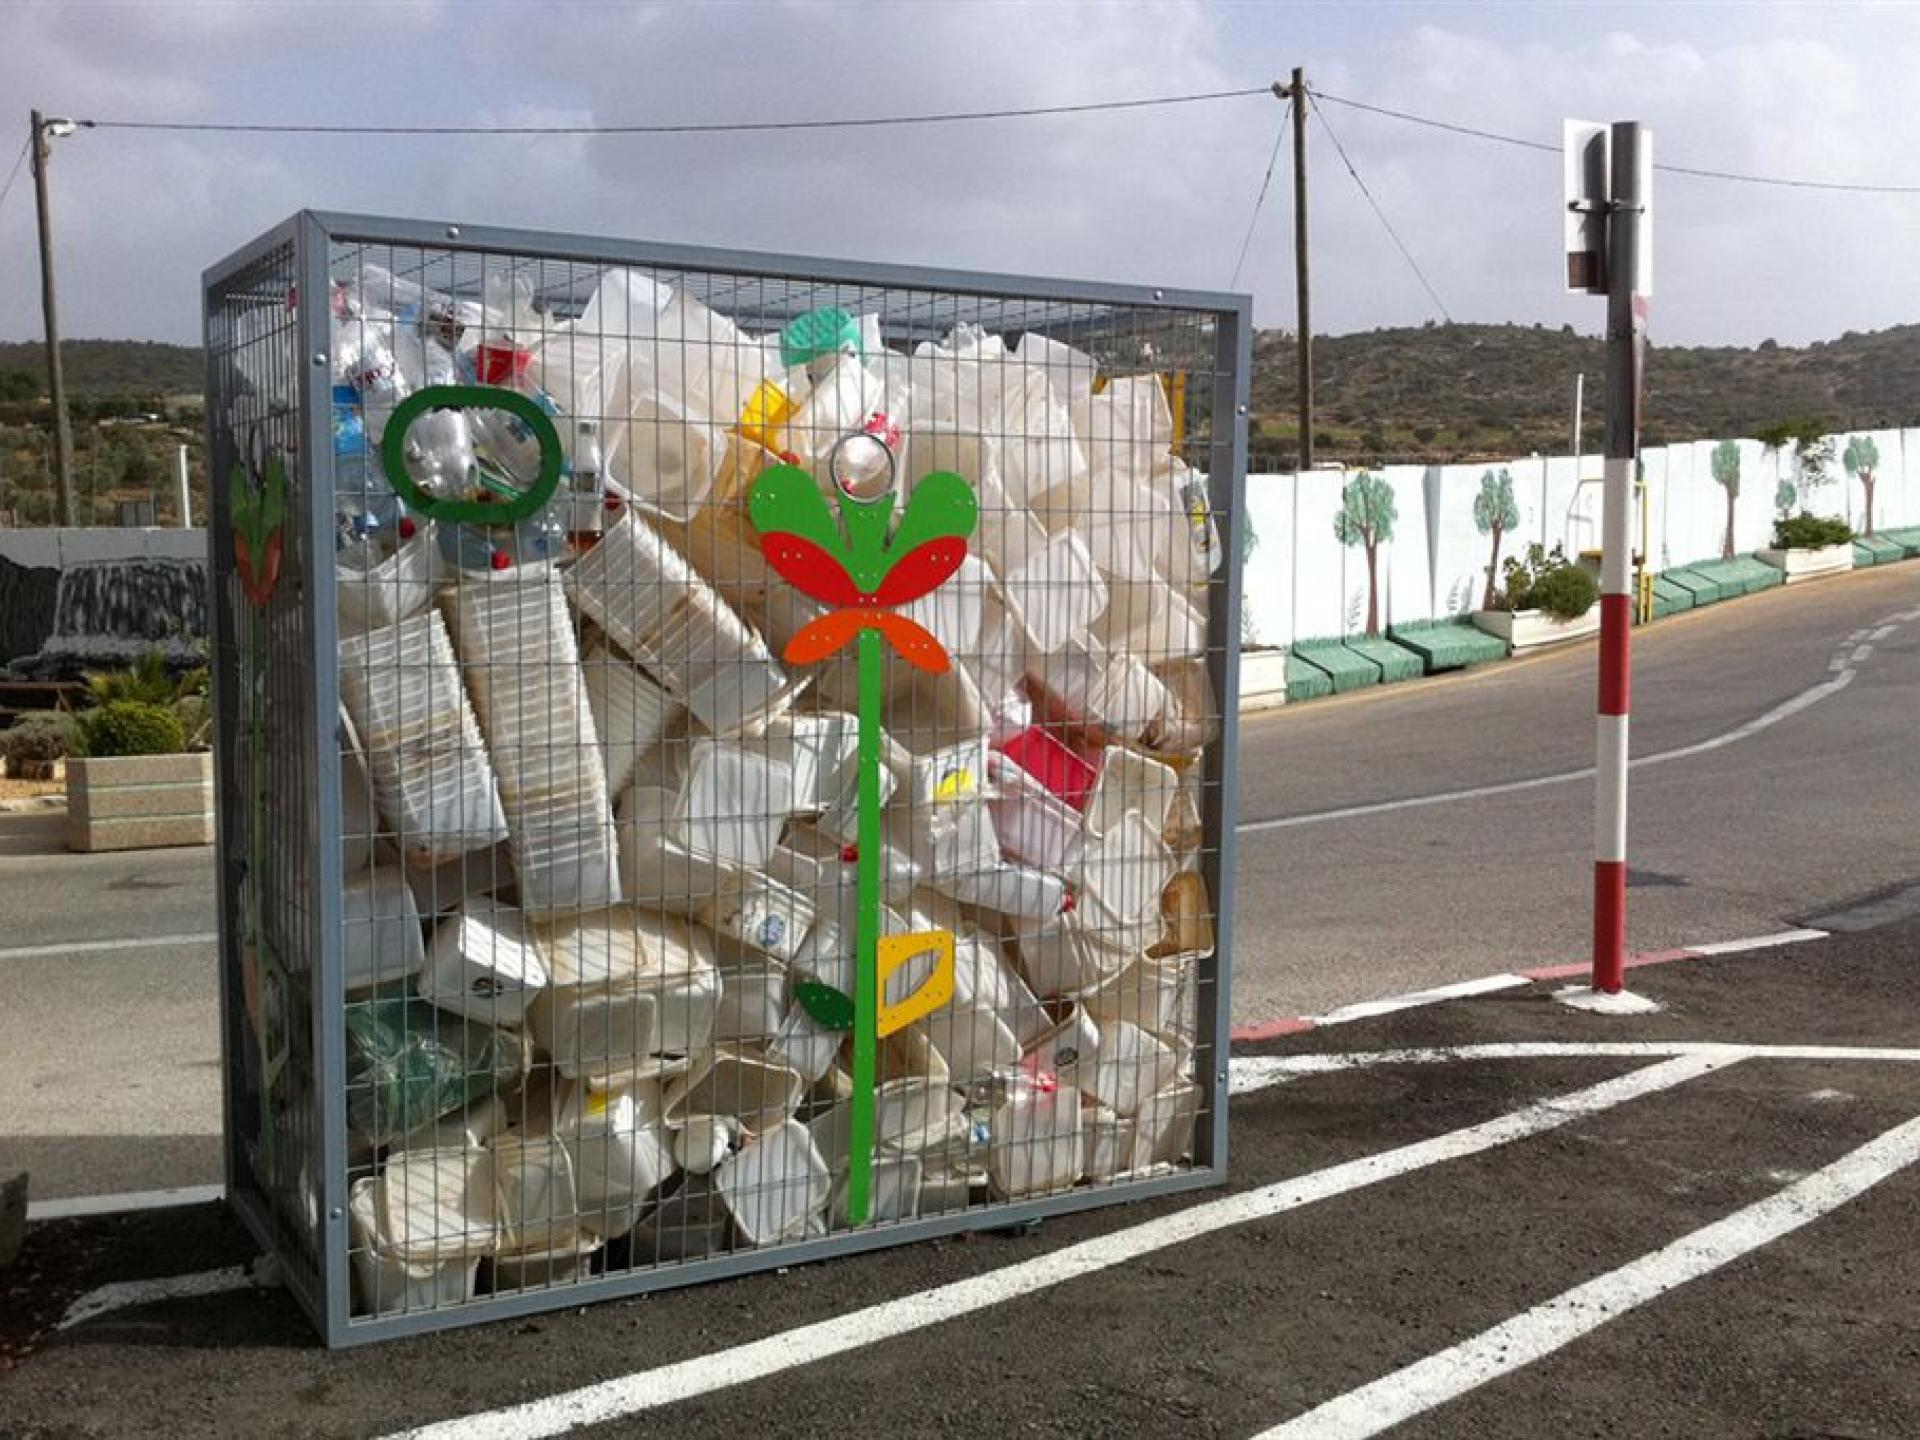 Barta'a/Reikhan checkpoint 09.06.13